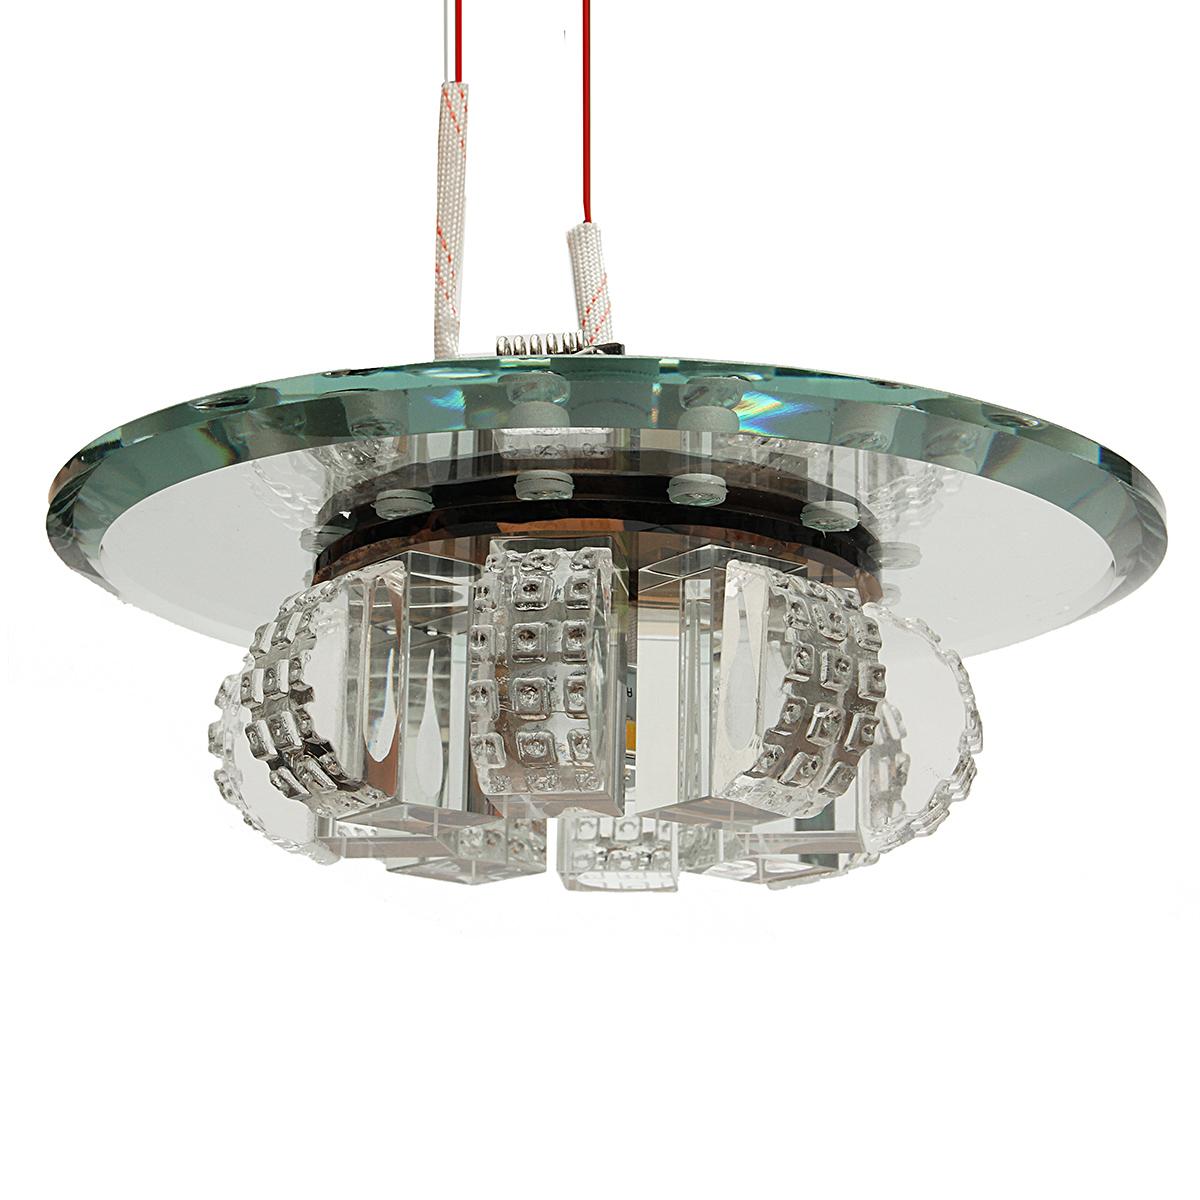 Modern Crystal LED Ceiling Light Pendant Lamp Fixture